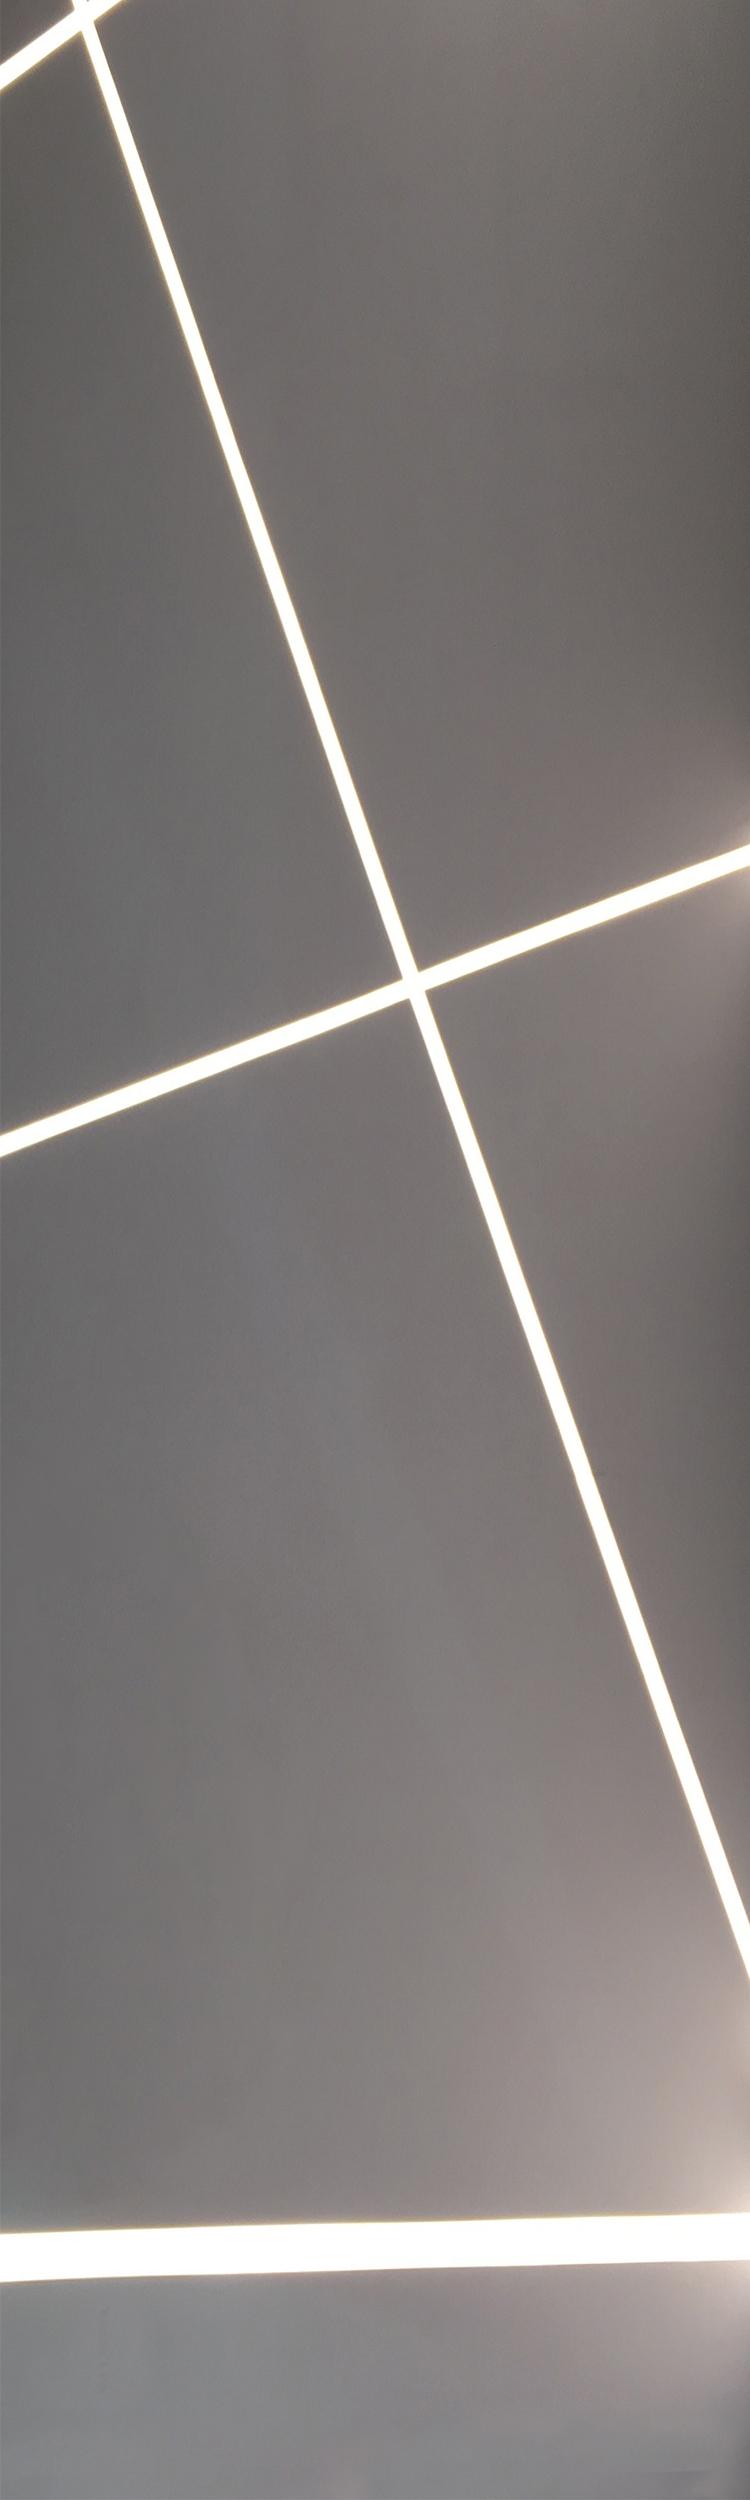 Banner-Abstract-.jpg